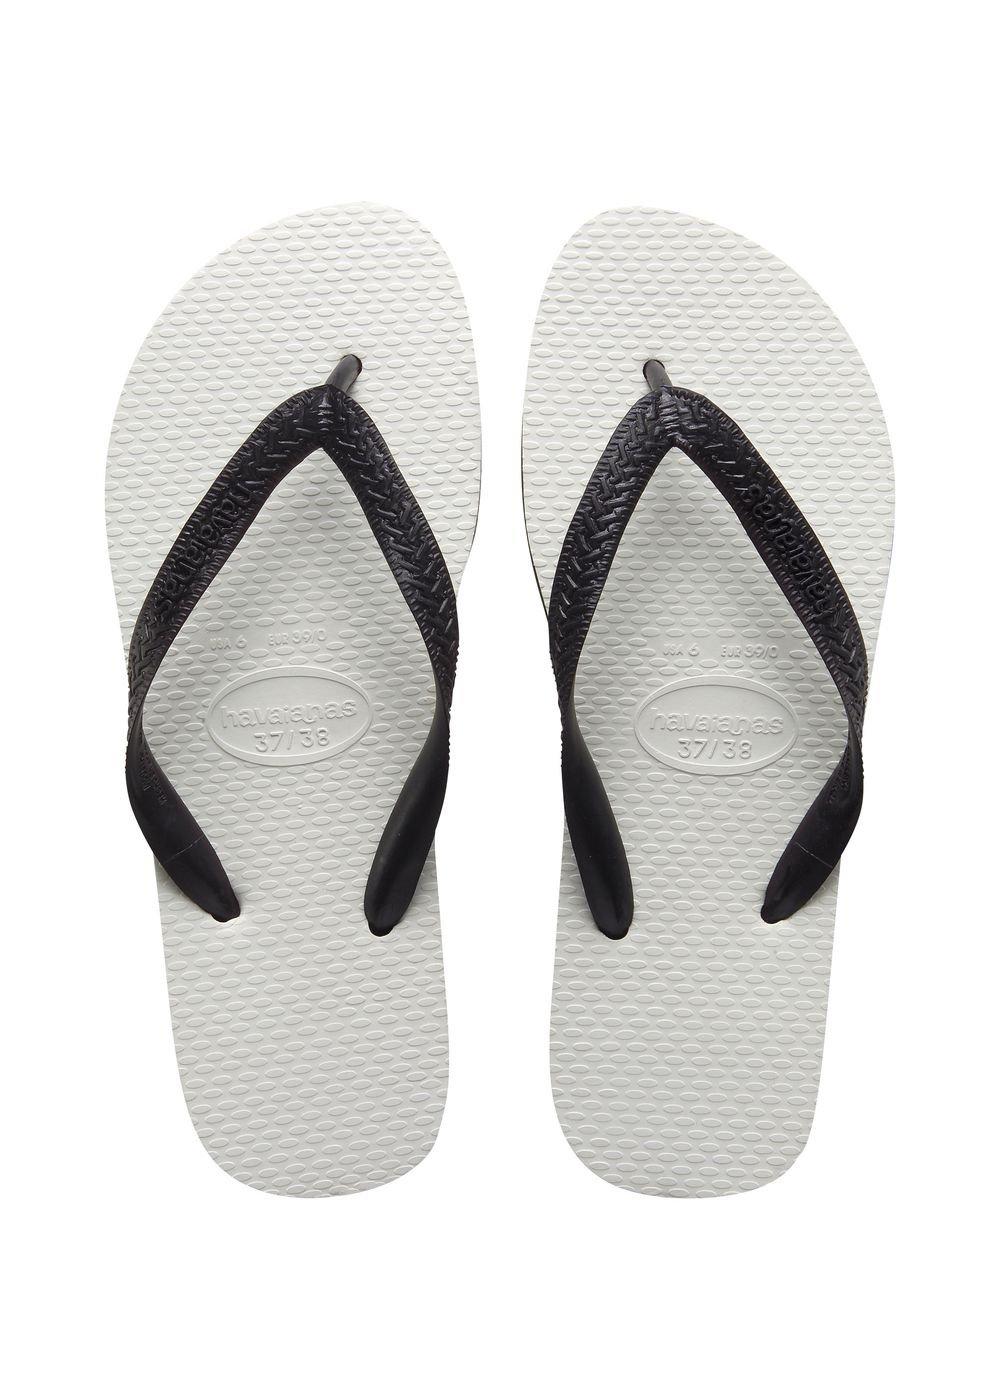 Havaianas Flip Flops Tradicional Zehentrener fuuml;r Mauml;nner/Frauen  35/36 EU (33/34 Brazilian)|Schwarz 0090